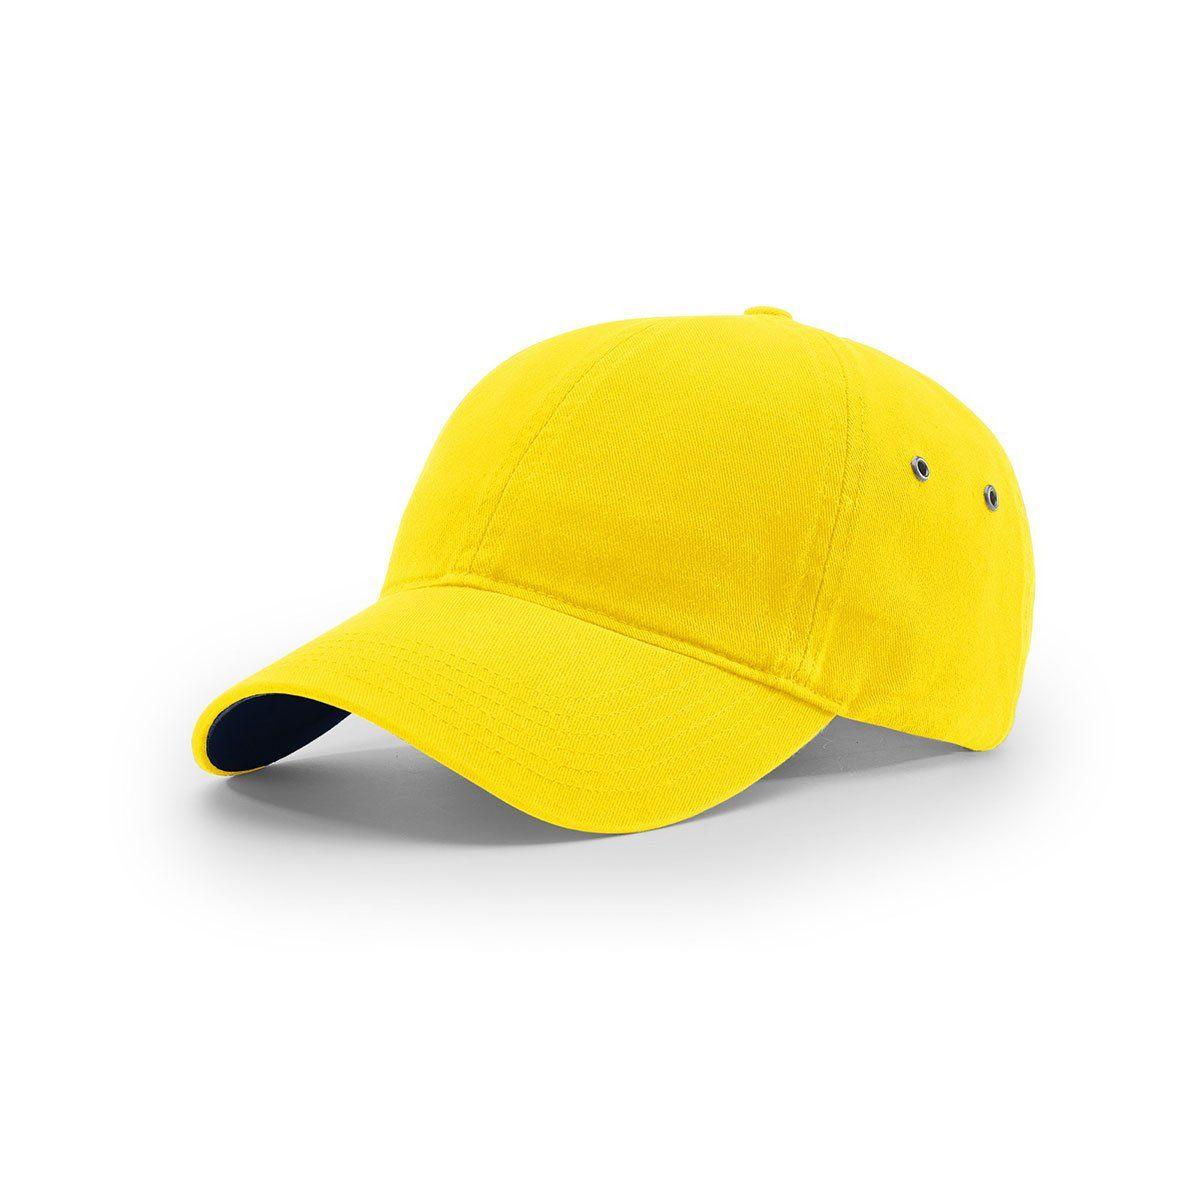 1e5db6b1190fb Richardson Yellow Lifestyle Unstructured Washed Chino Polo Cap ...